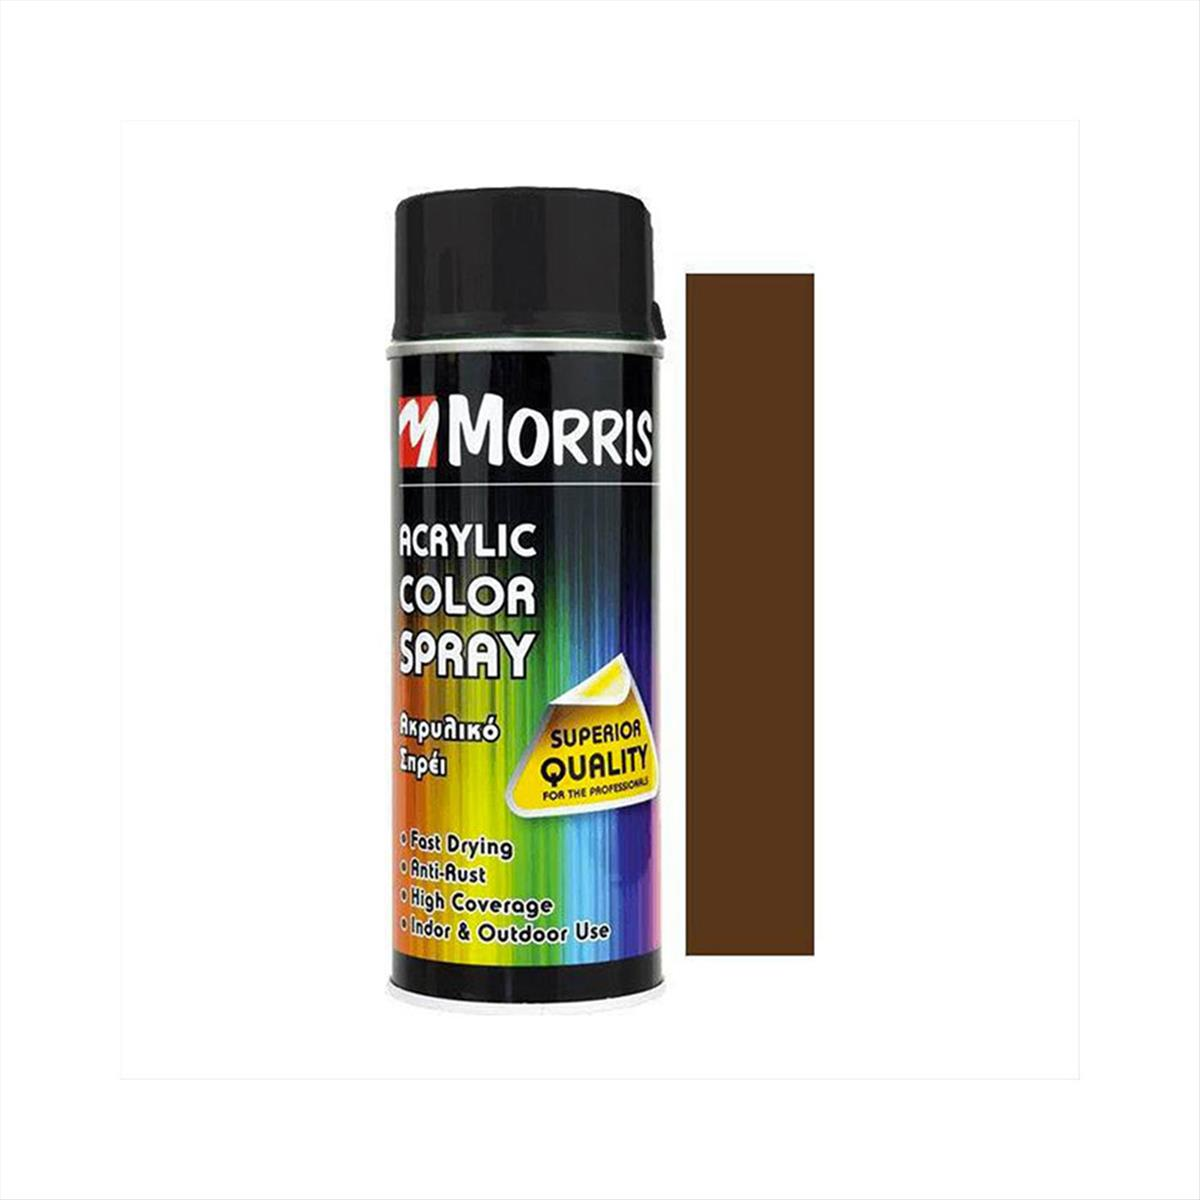 MORRIS-28524.jpeg